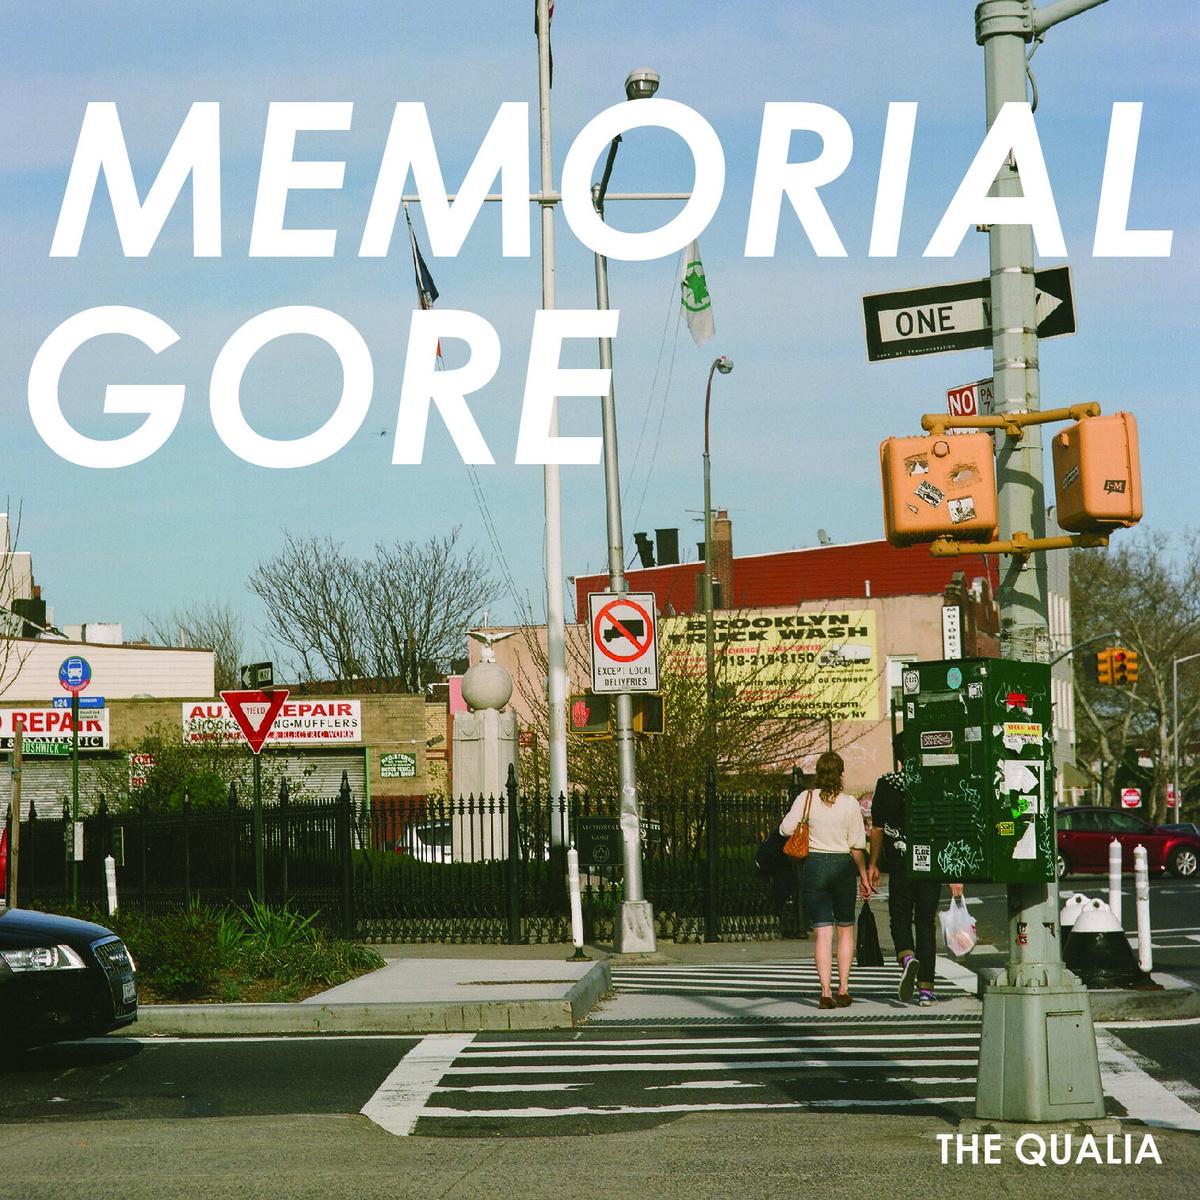 the_qualia_memorial_gore_cover